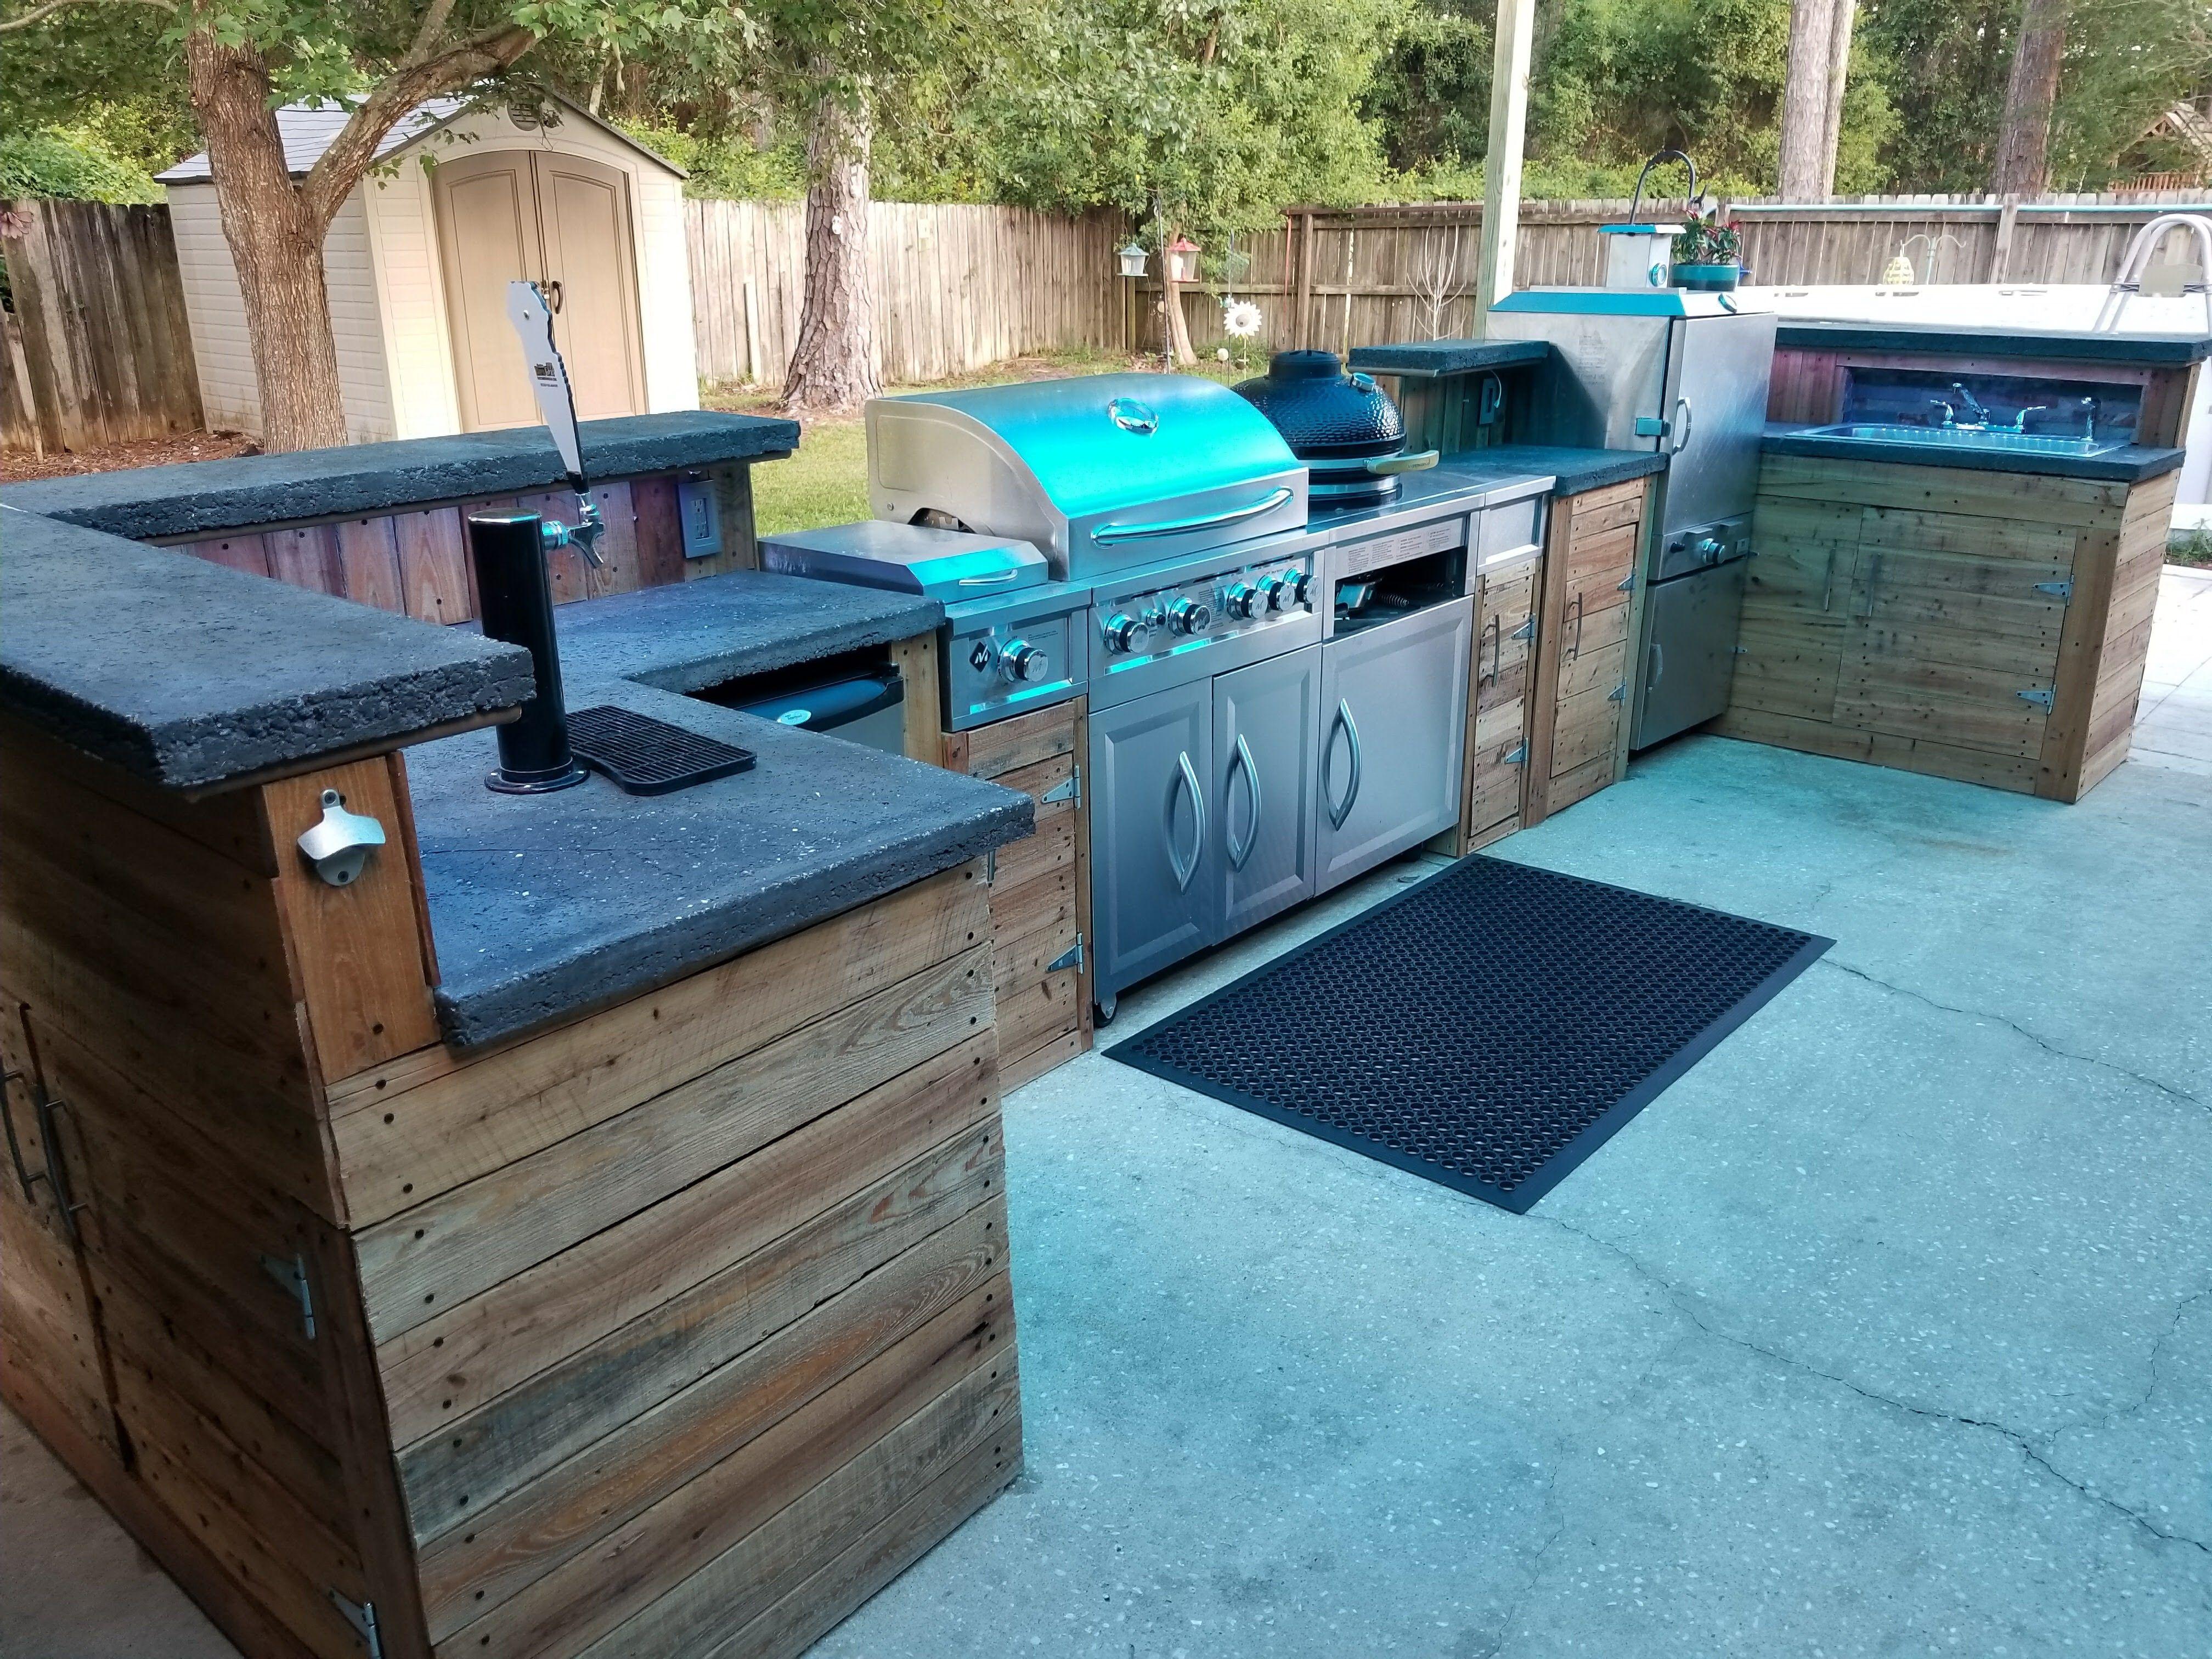 Outdoor Kitchen Outdoor Kitchen Design Outdoor Kitchen Design Layout Outdoor Kitchen